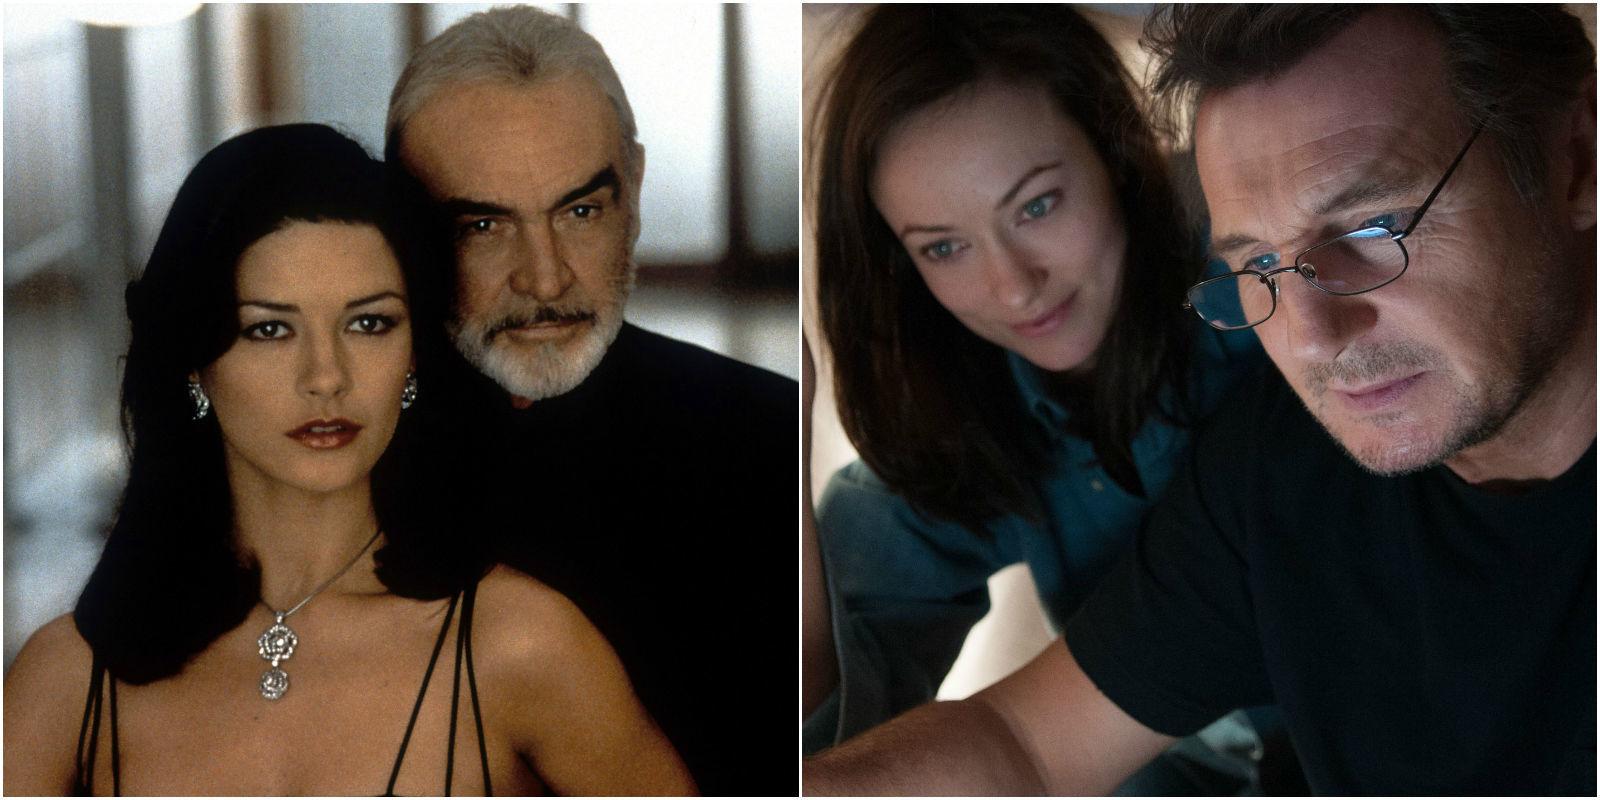 Age disparity romance movies